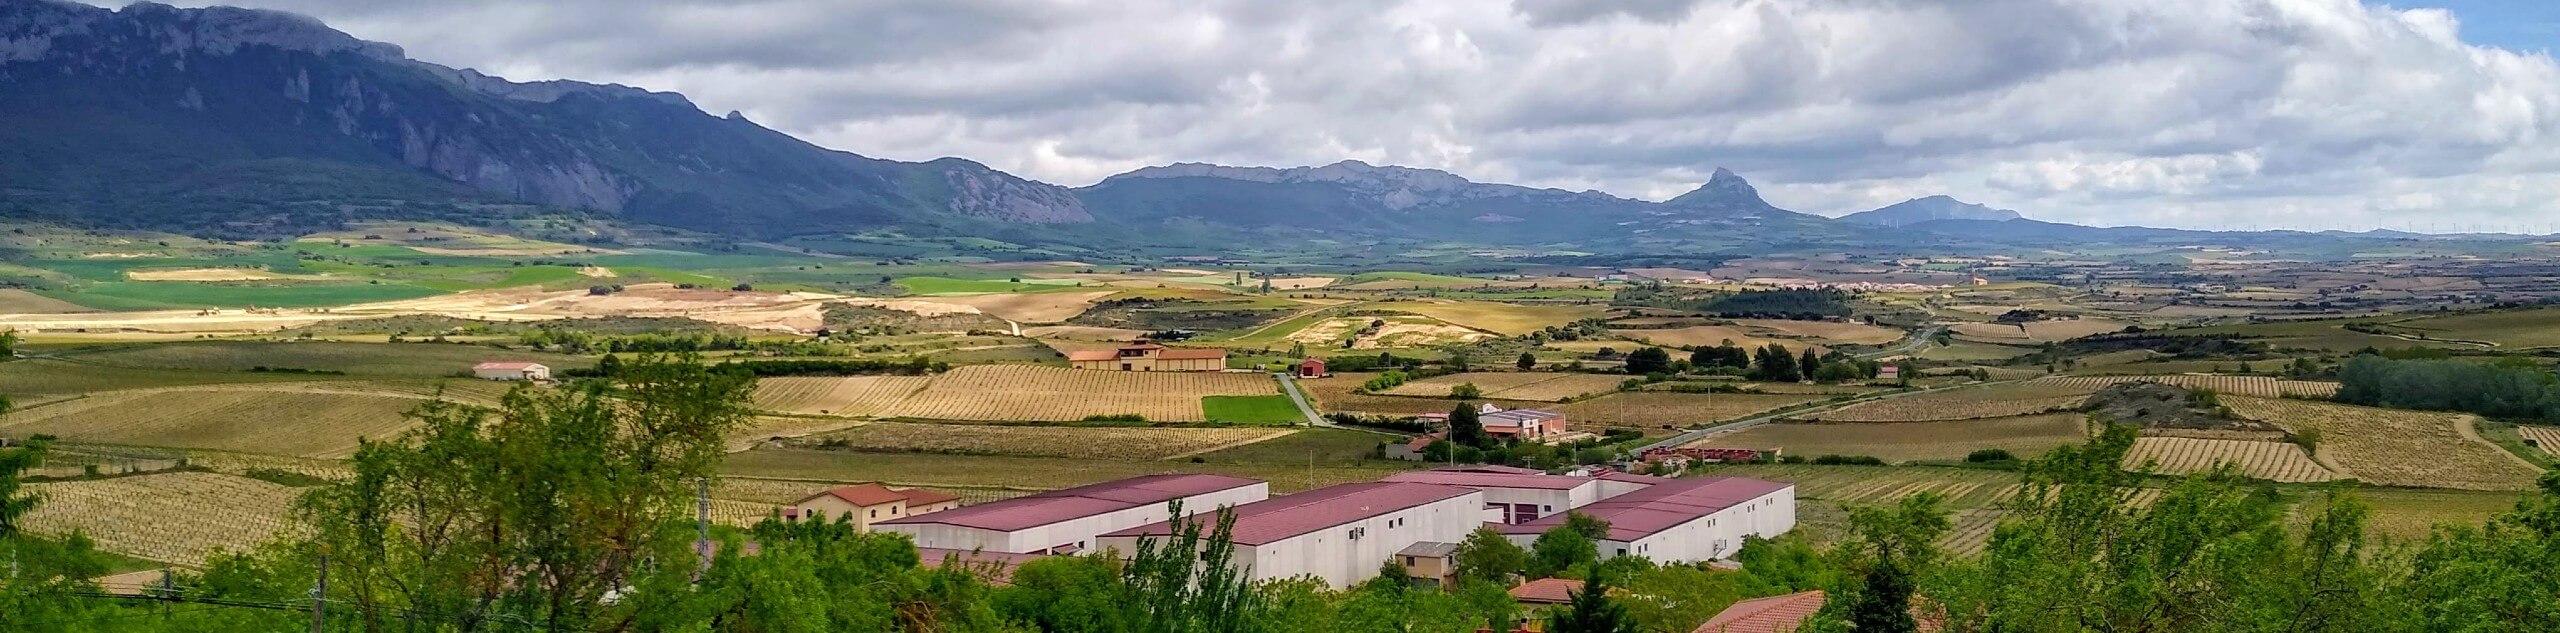 Wine Tour of La Rioja by Bike